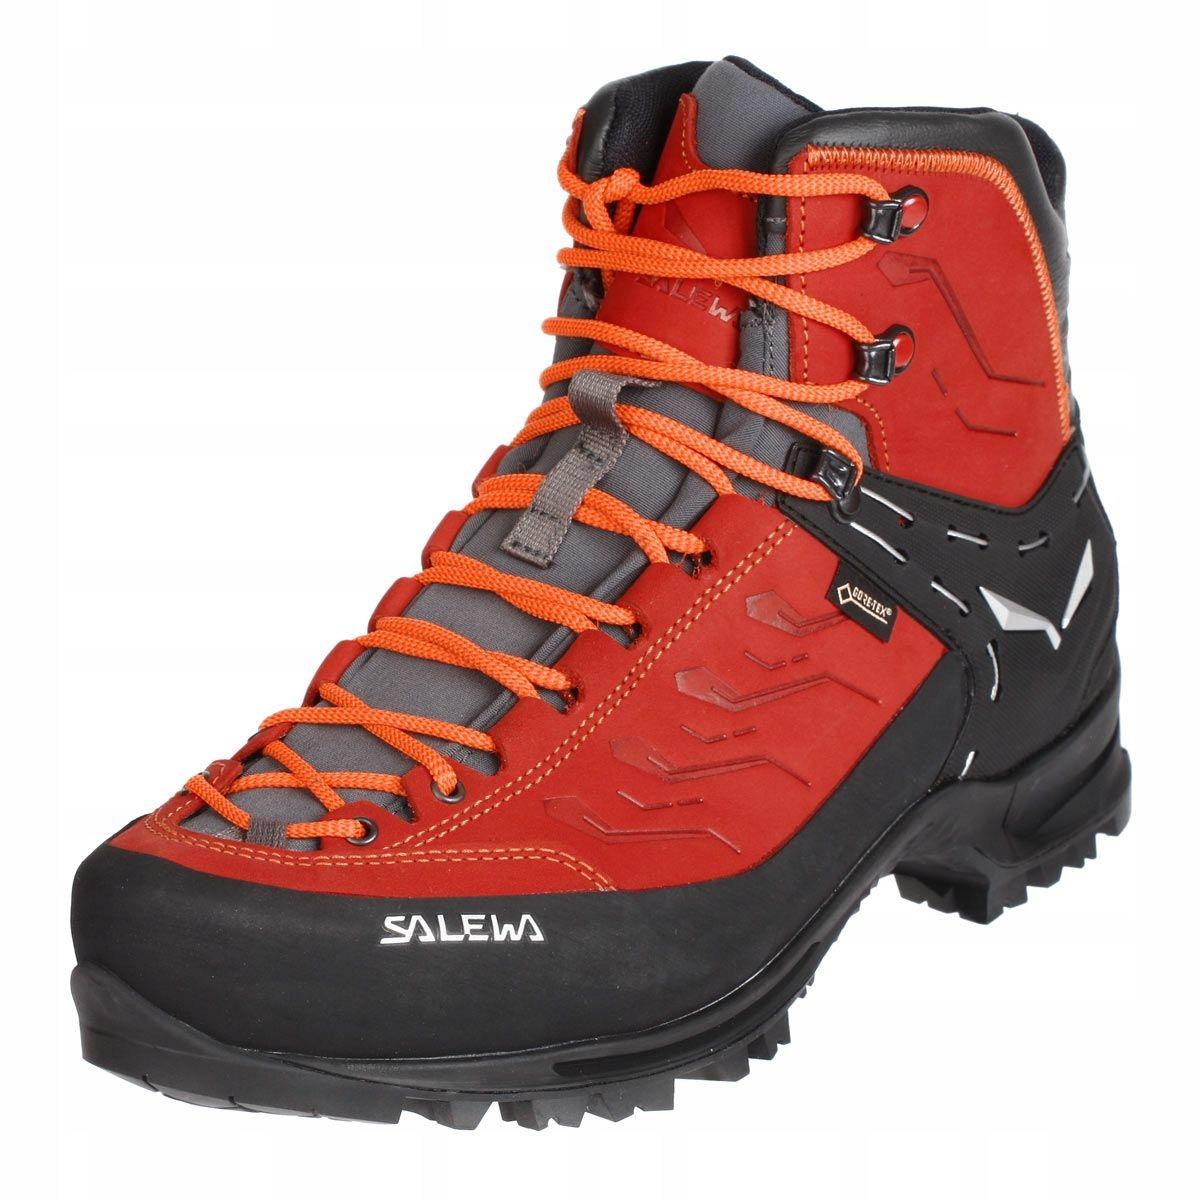 2bd740b4 Buty trekkingowe Salewa MS MTN Rapace GTX 44,5 - 7714035196 ...